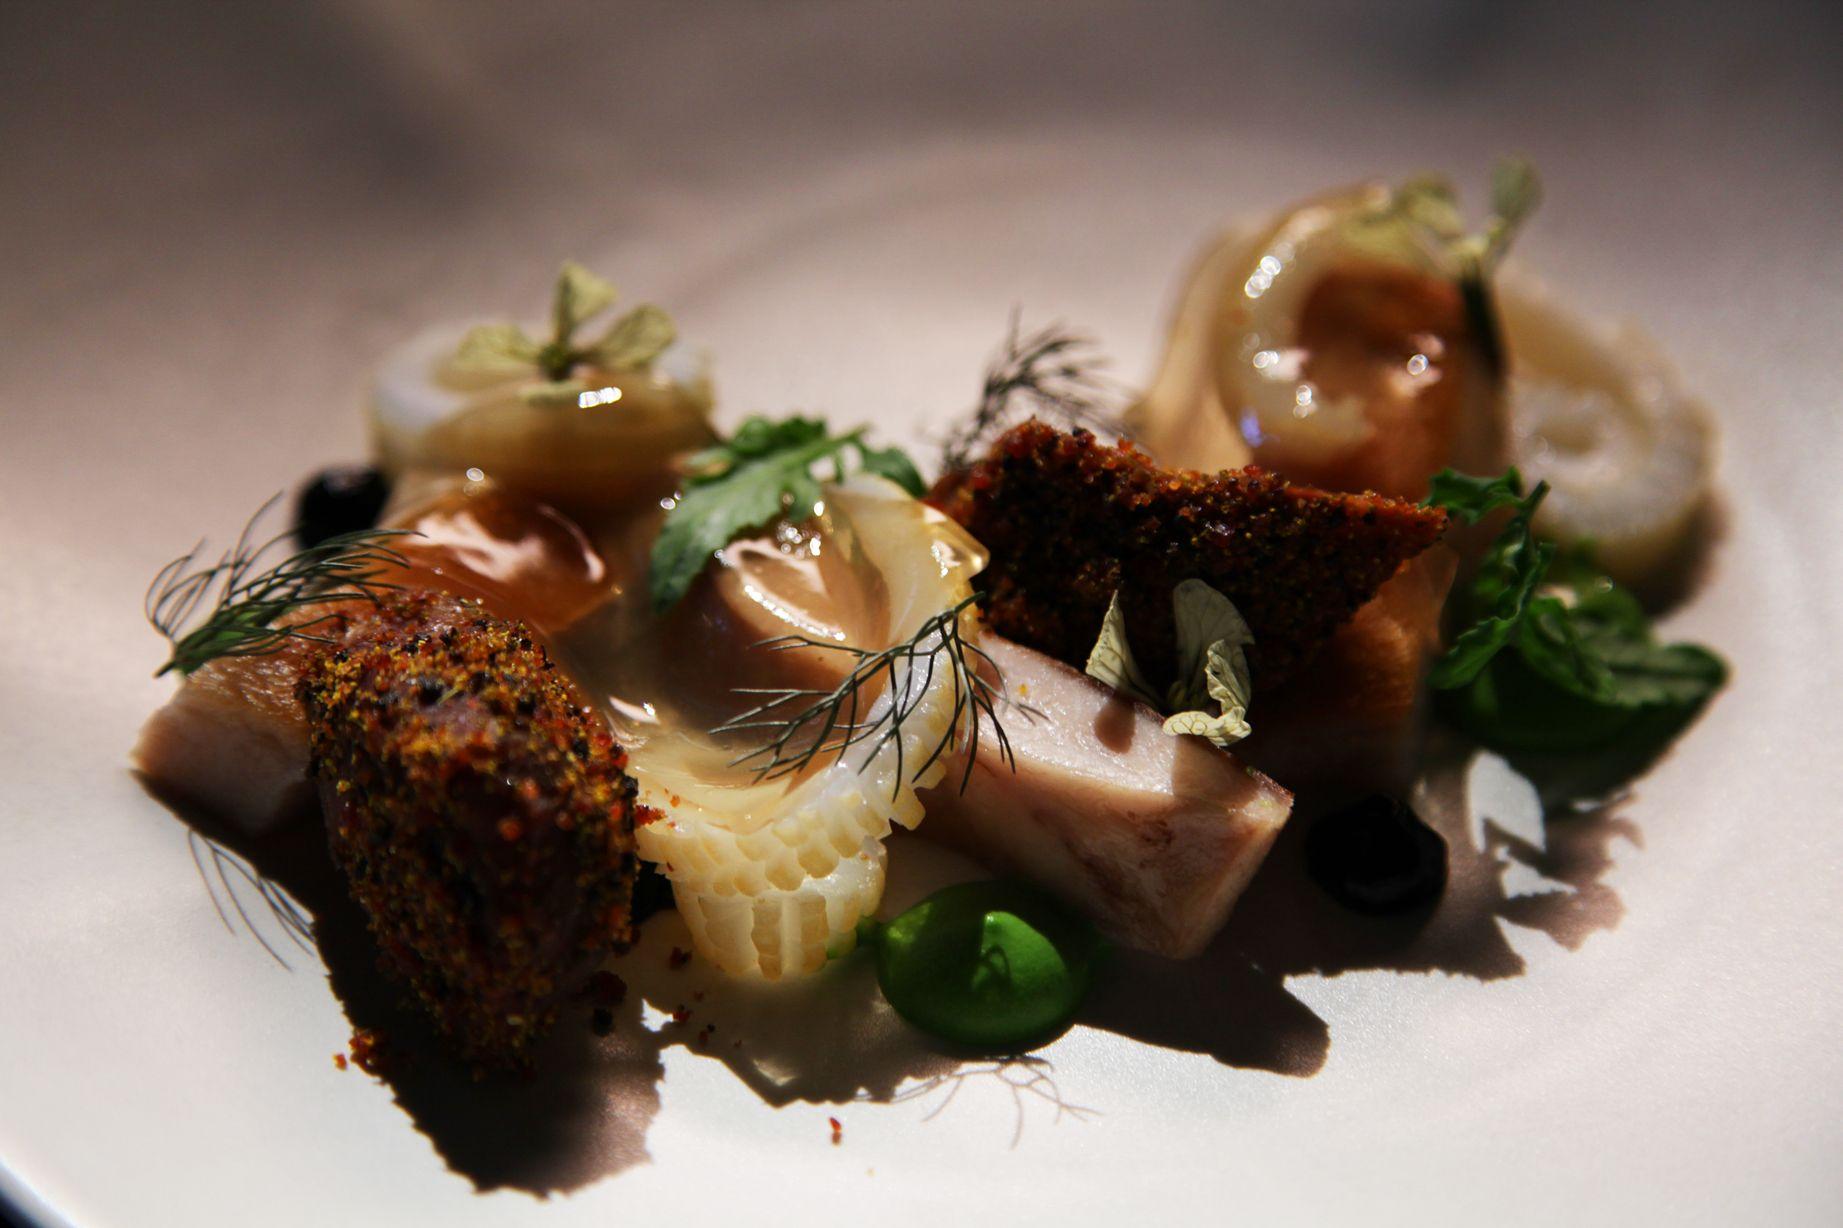 Slow cooked pork cheek with fennel black garlic and calamari